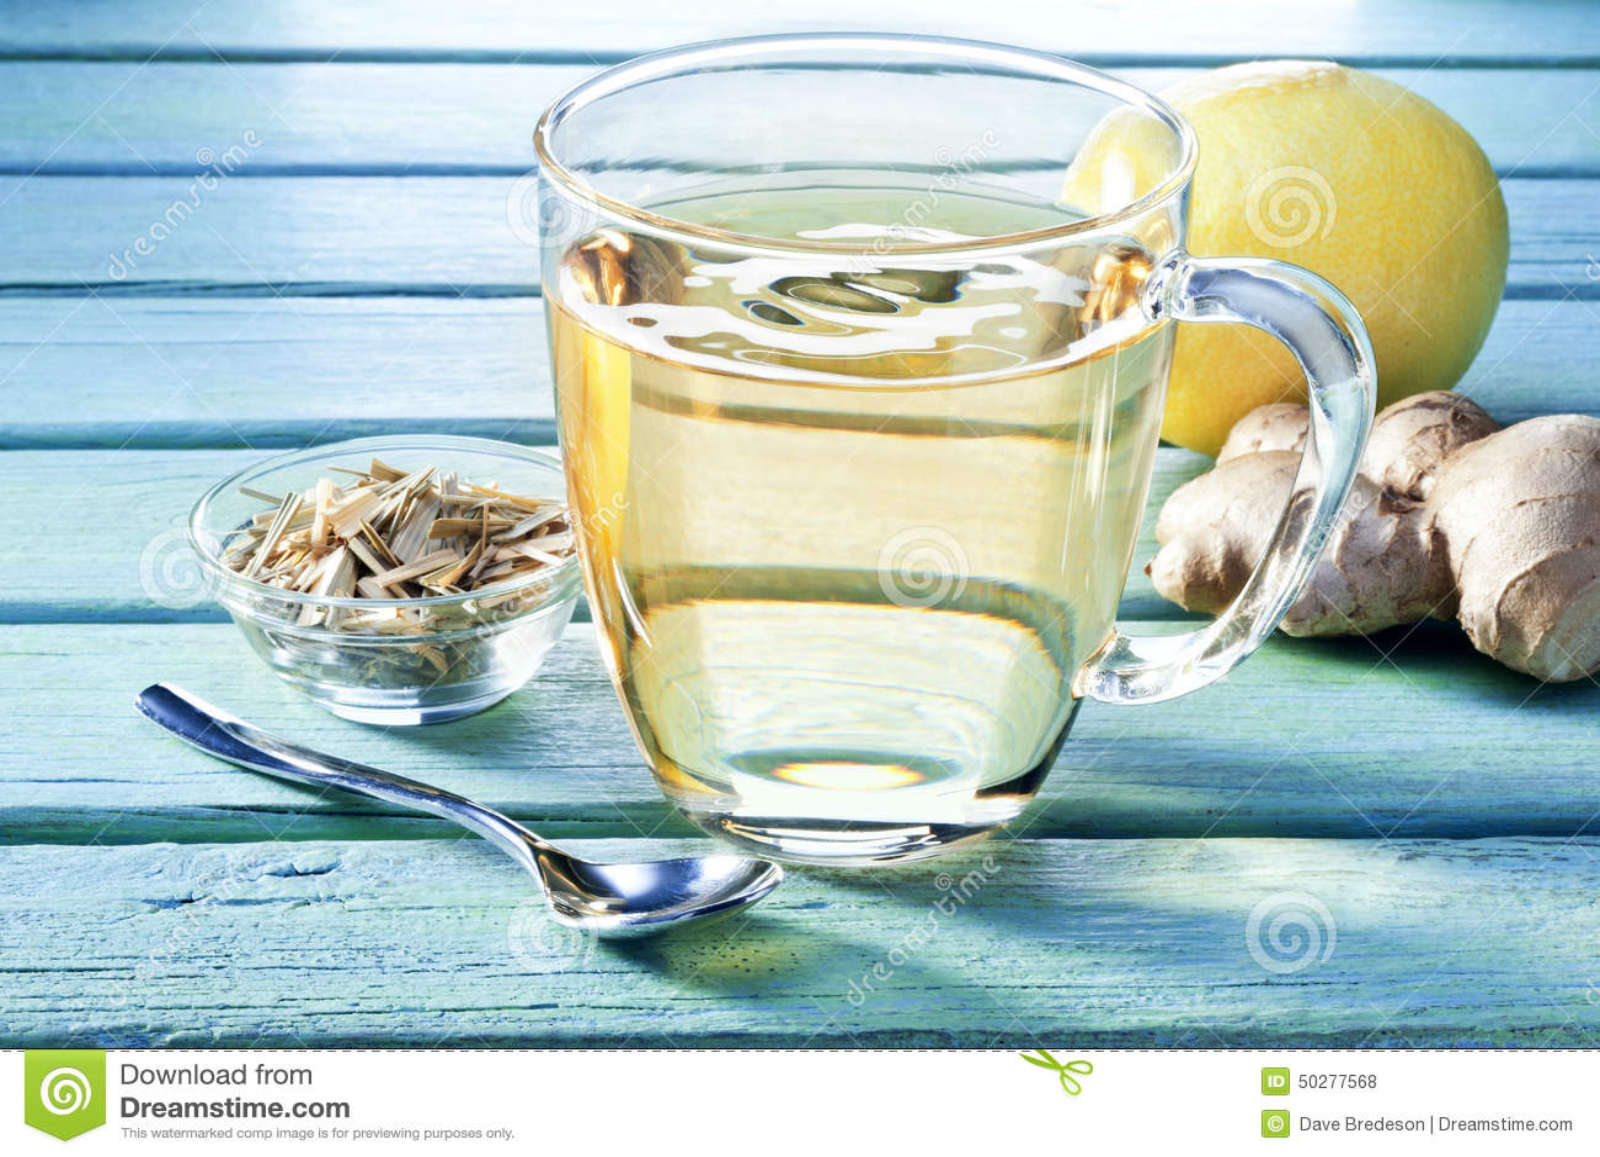 Ginger Lemon Tea Cup